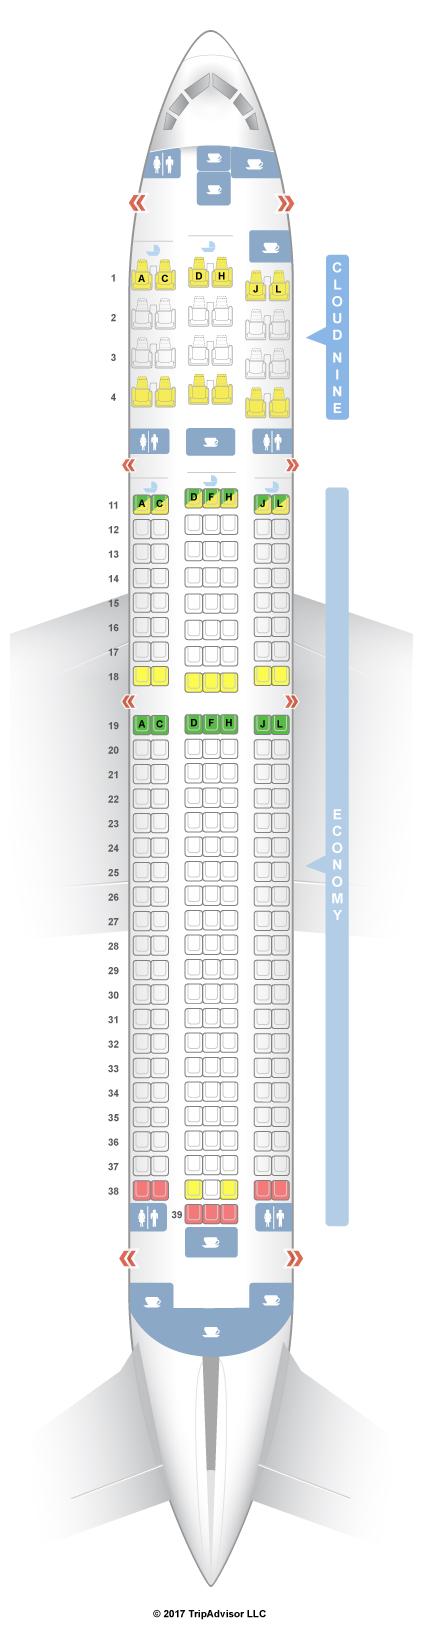 Thomson Boeing 767 Passenger Seating Chart Brokeasshome Com